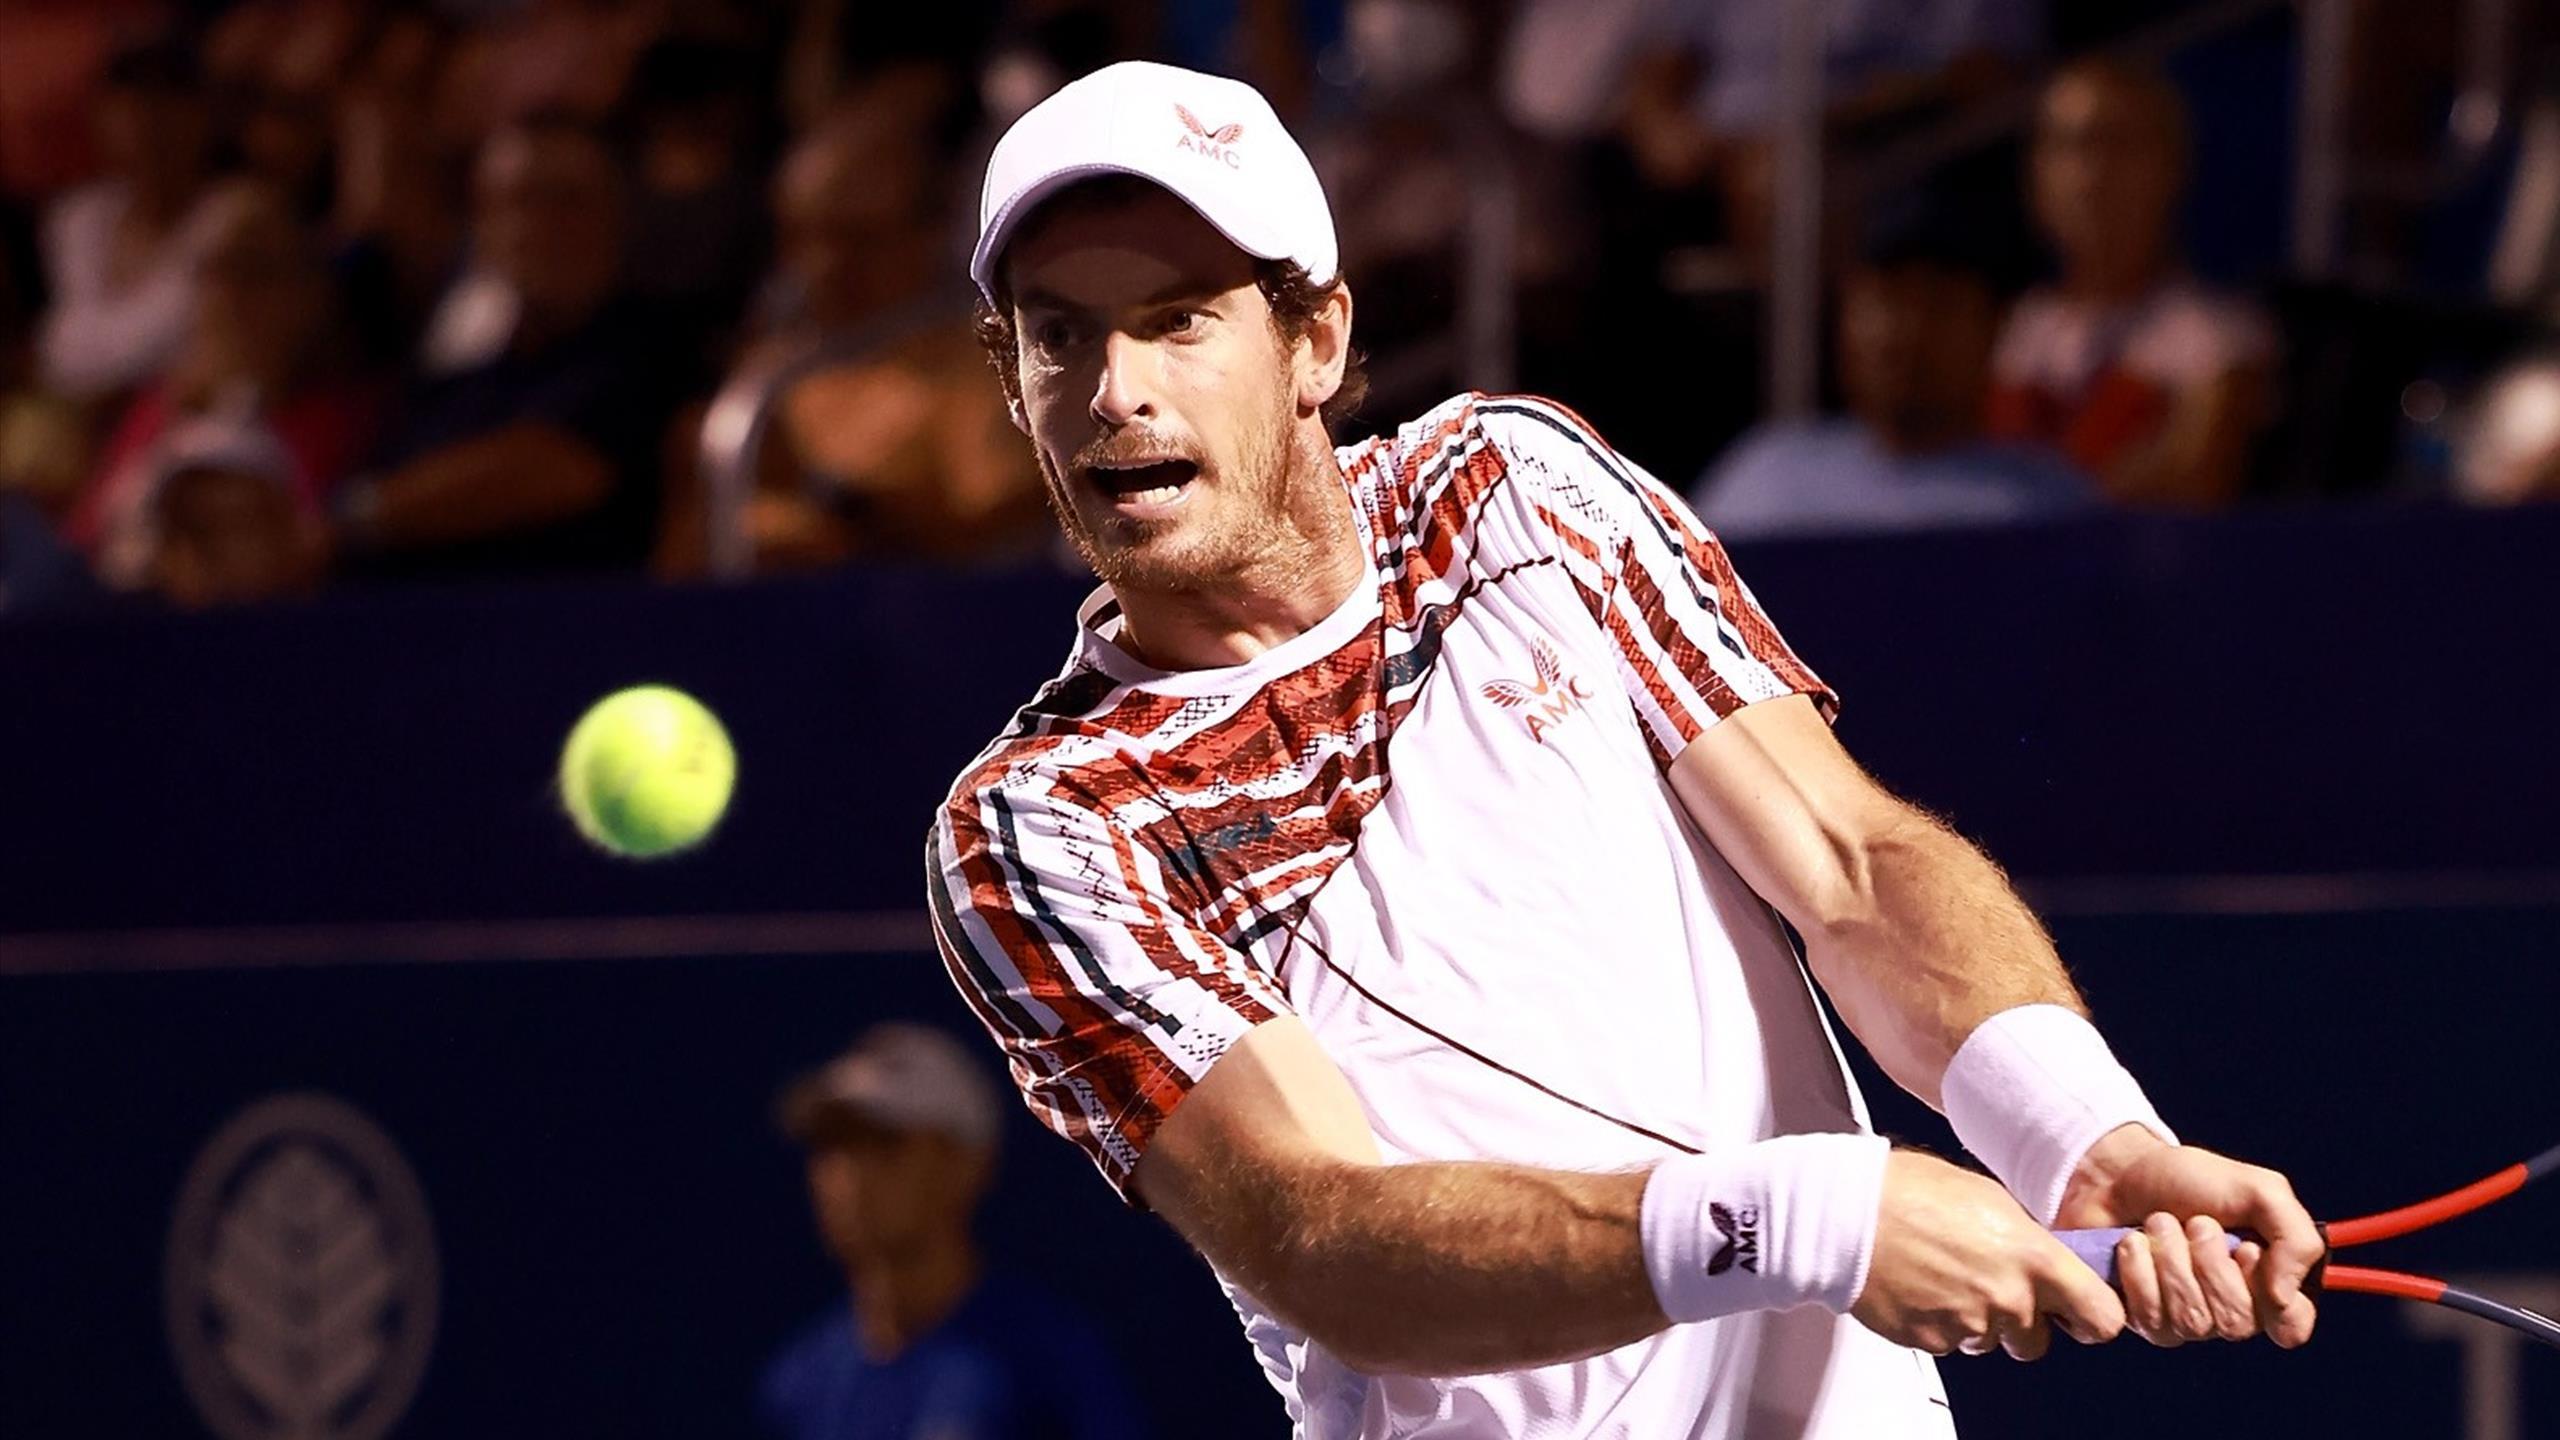 Us Open 2021 Andy Murray Draws World Number Three Stefanos Tsitsipas Novak Djokovic Faces Qualifier Eurosport